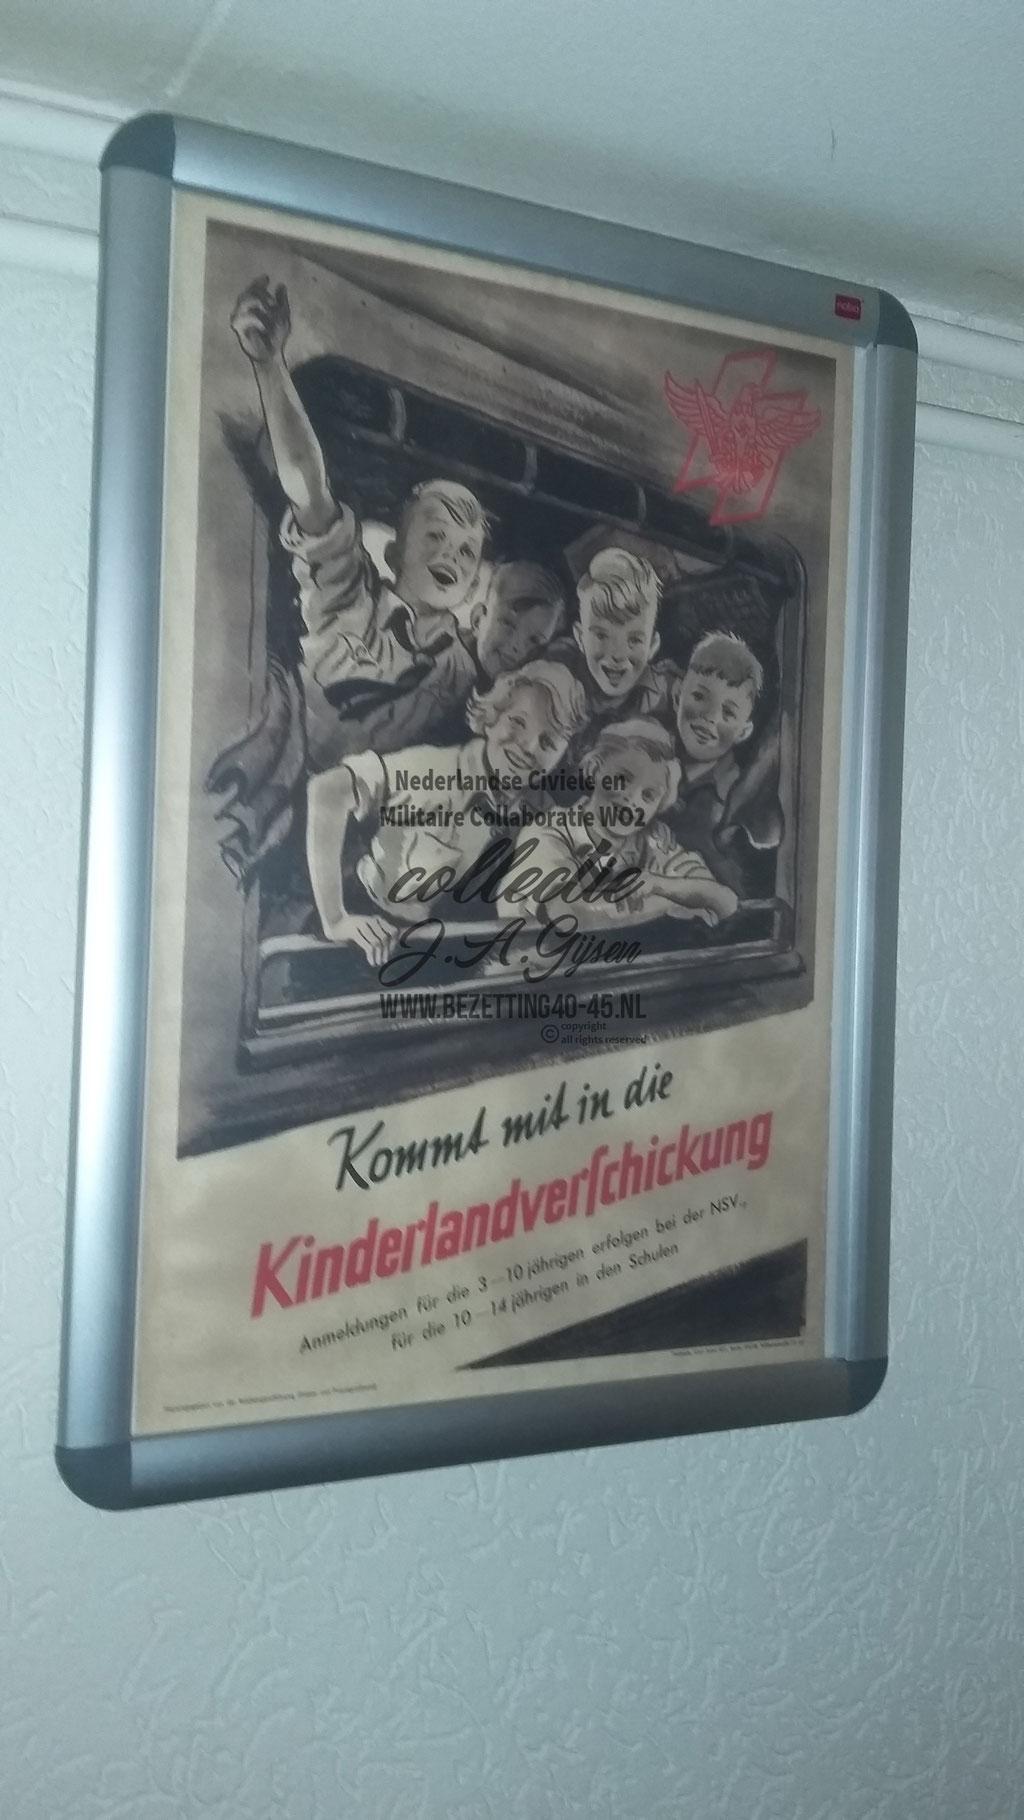 Poster affiche (Plakat) Hitler Jugend 'Kommt mit in die Kinderlandverschickung'